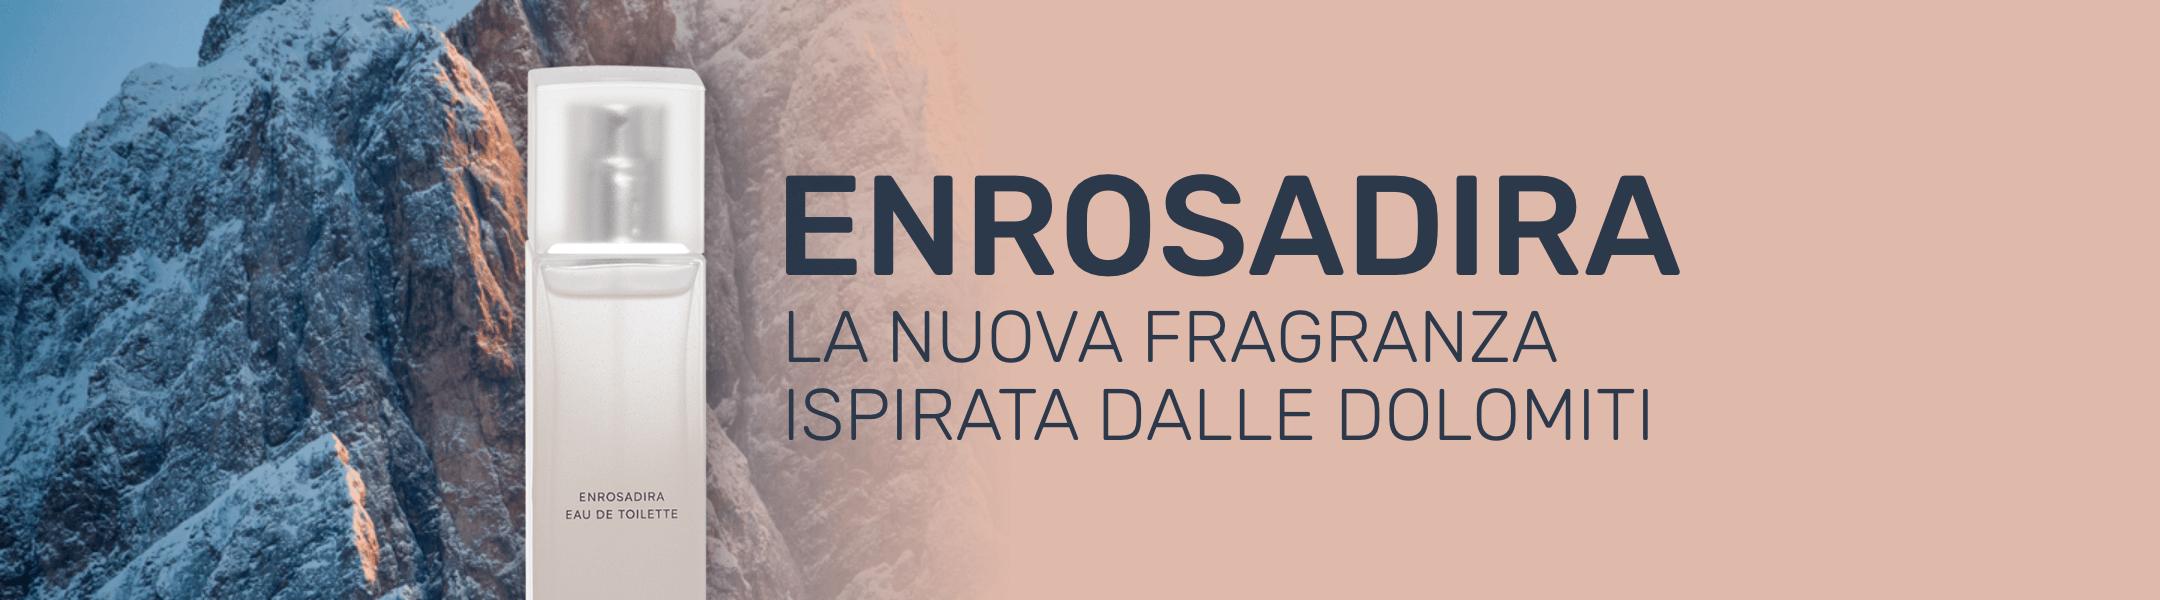 Dolomia Enrosadira - La nuova Fragranza Ispirata dalle Dolomiti